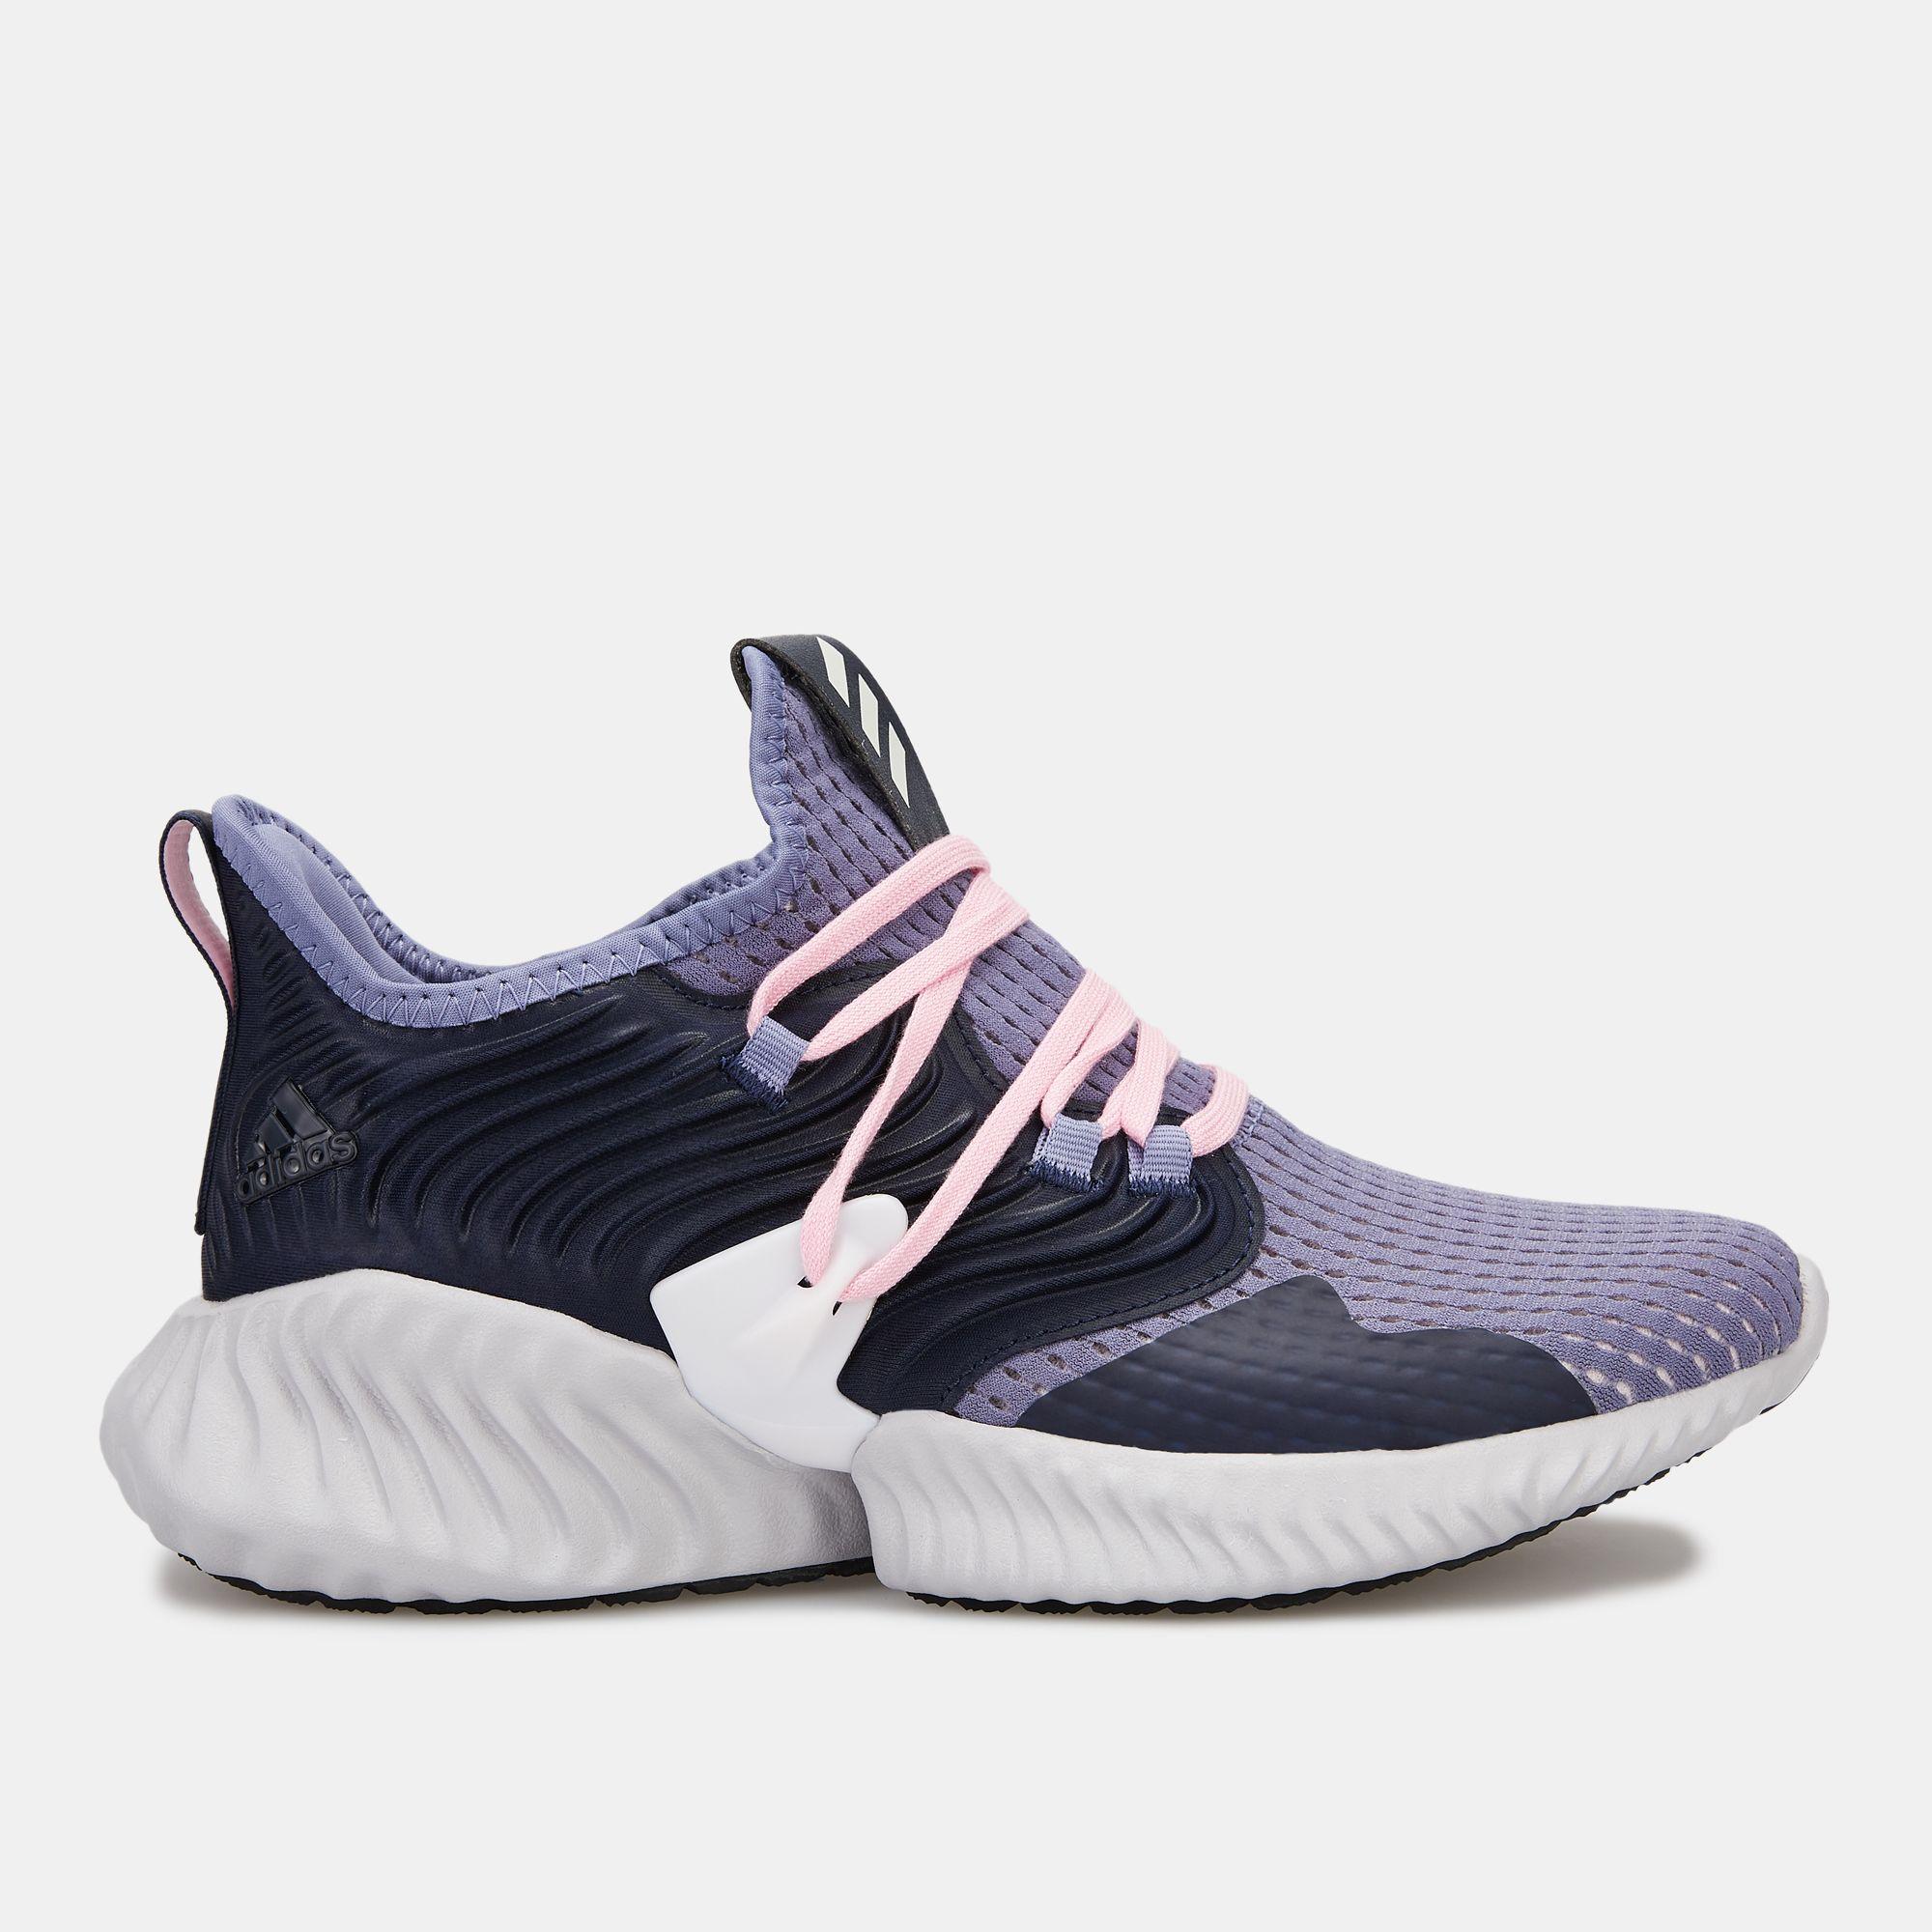 83a01c980bc adidas Women s Alphabounce Instinct CC Shoe